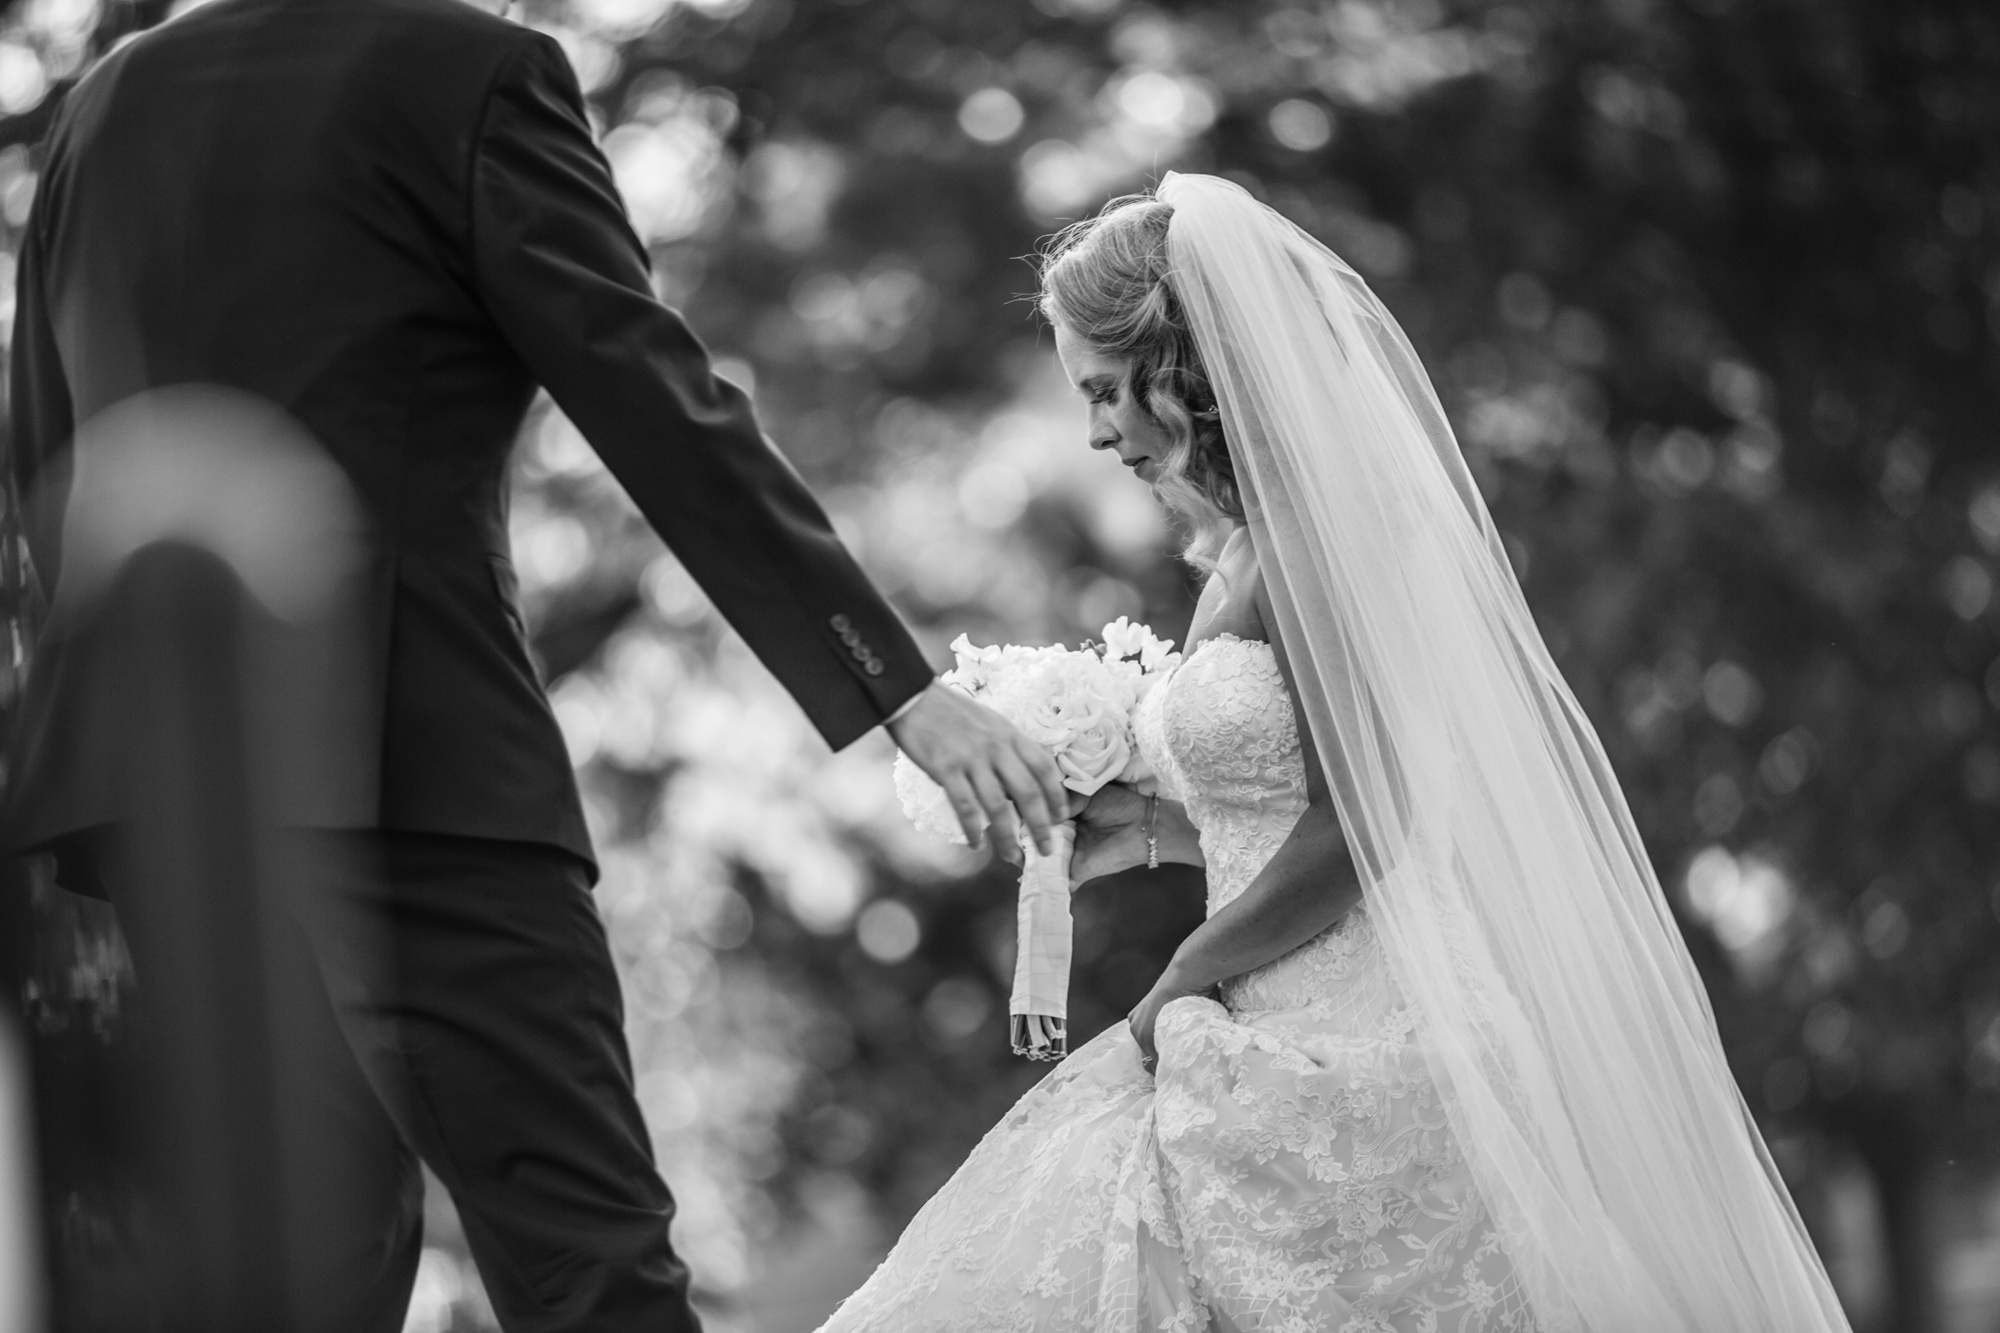 scranton_wedding_photographer_lettieri_pa (32 of 47).jpg